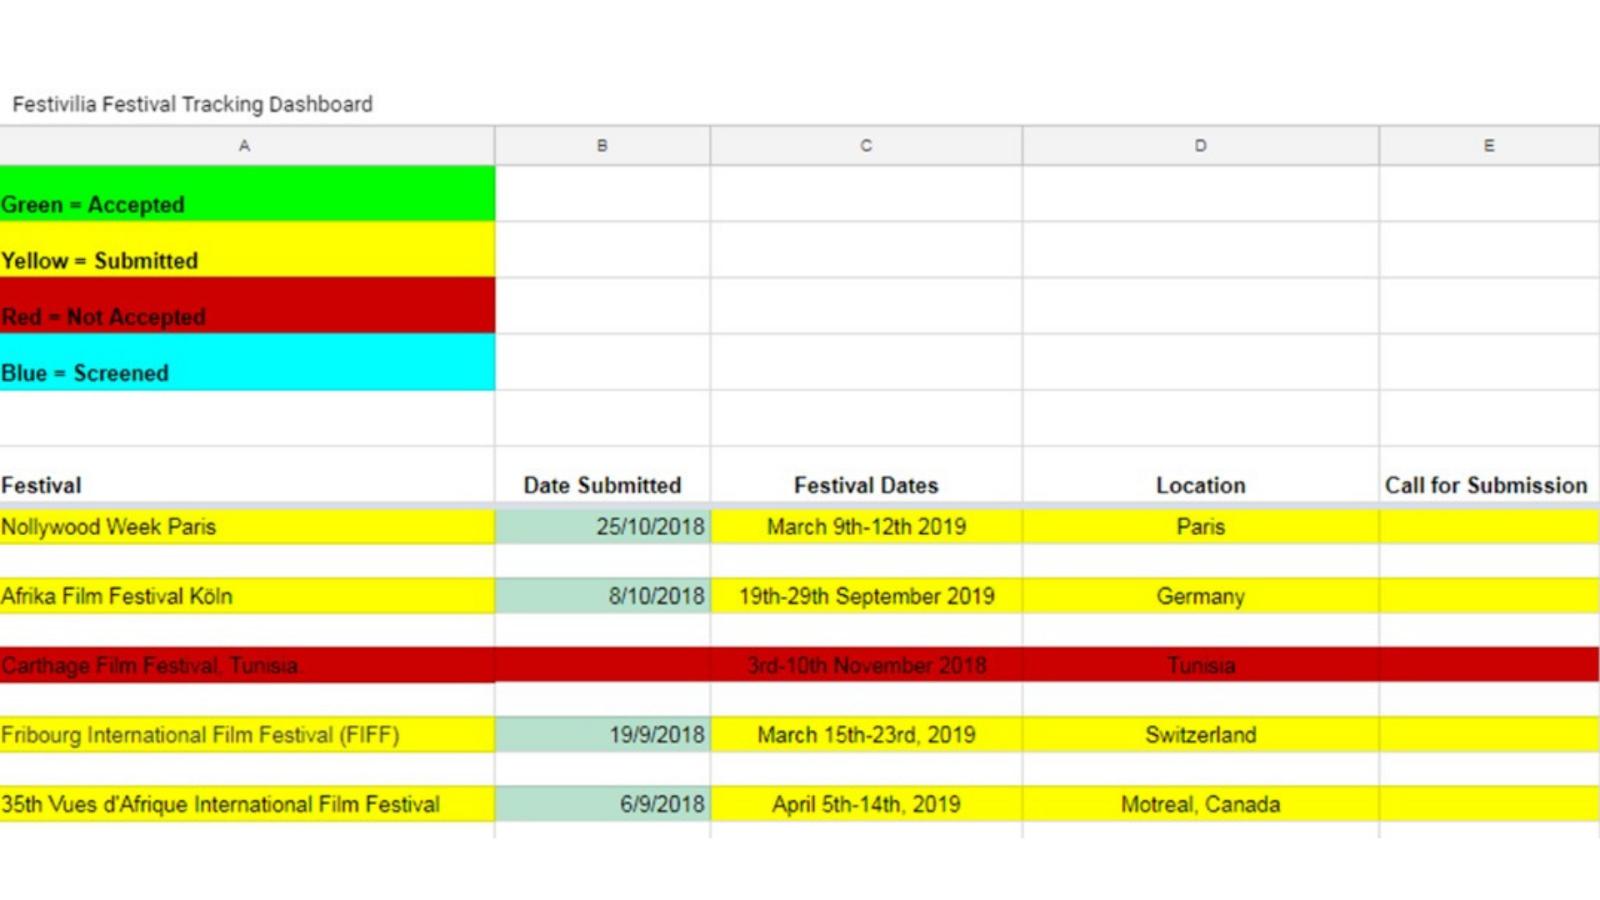 Festivilia's Google Sheet